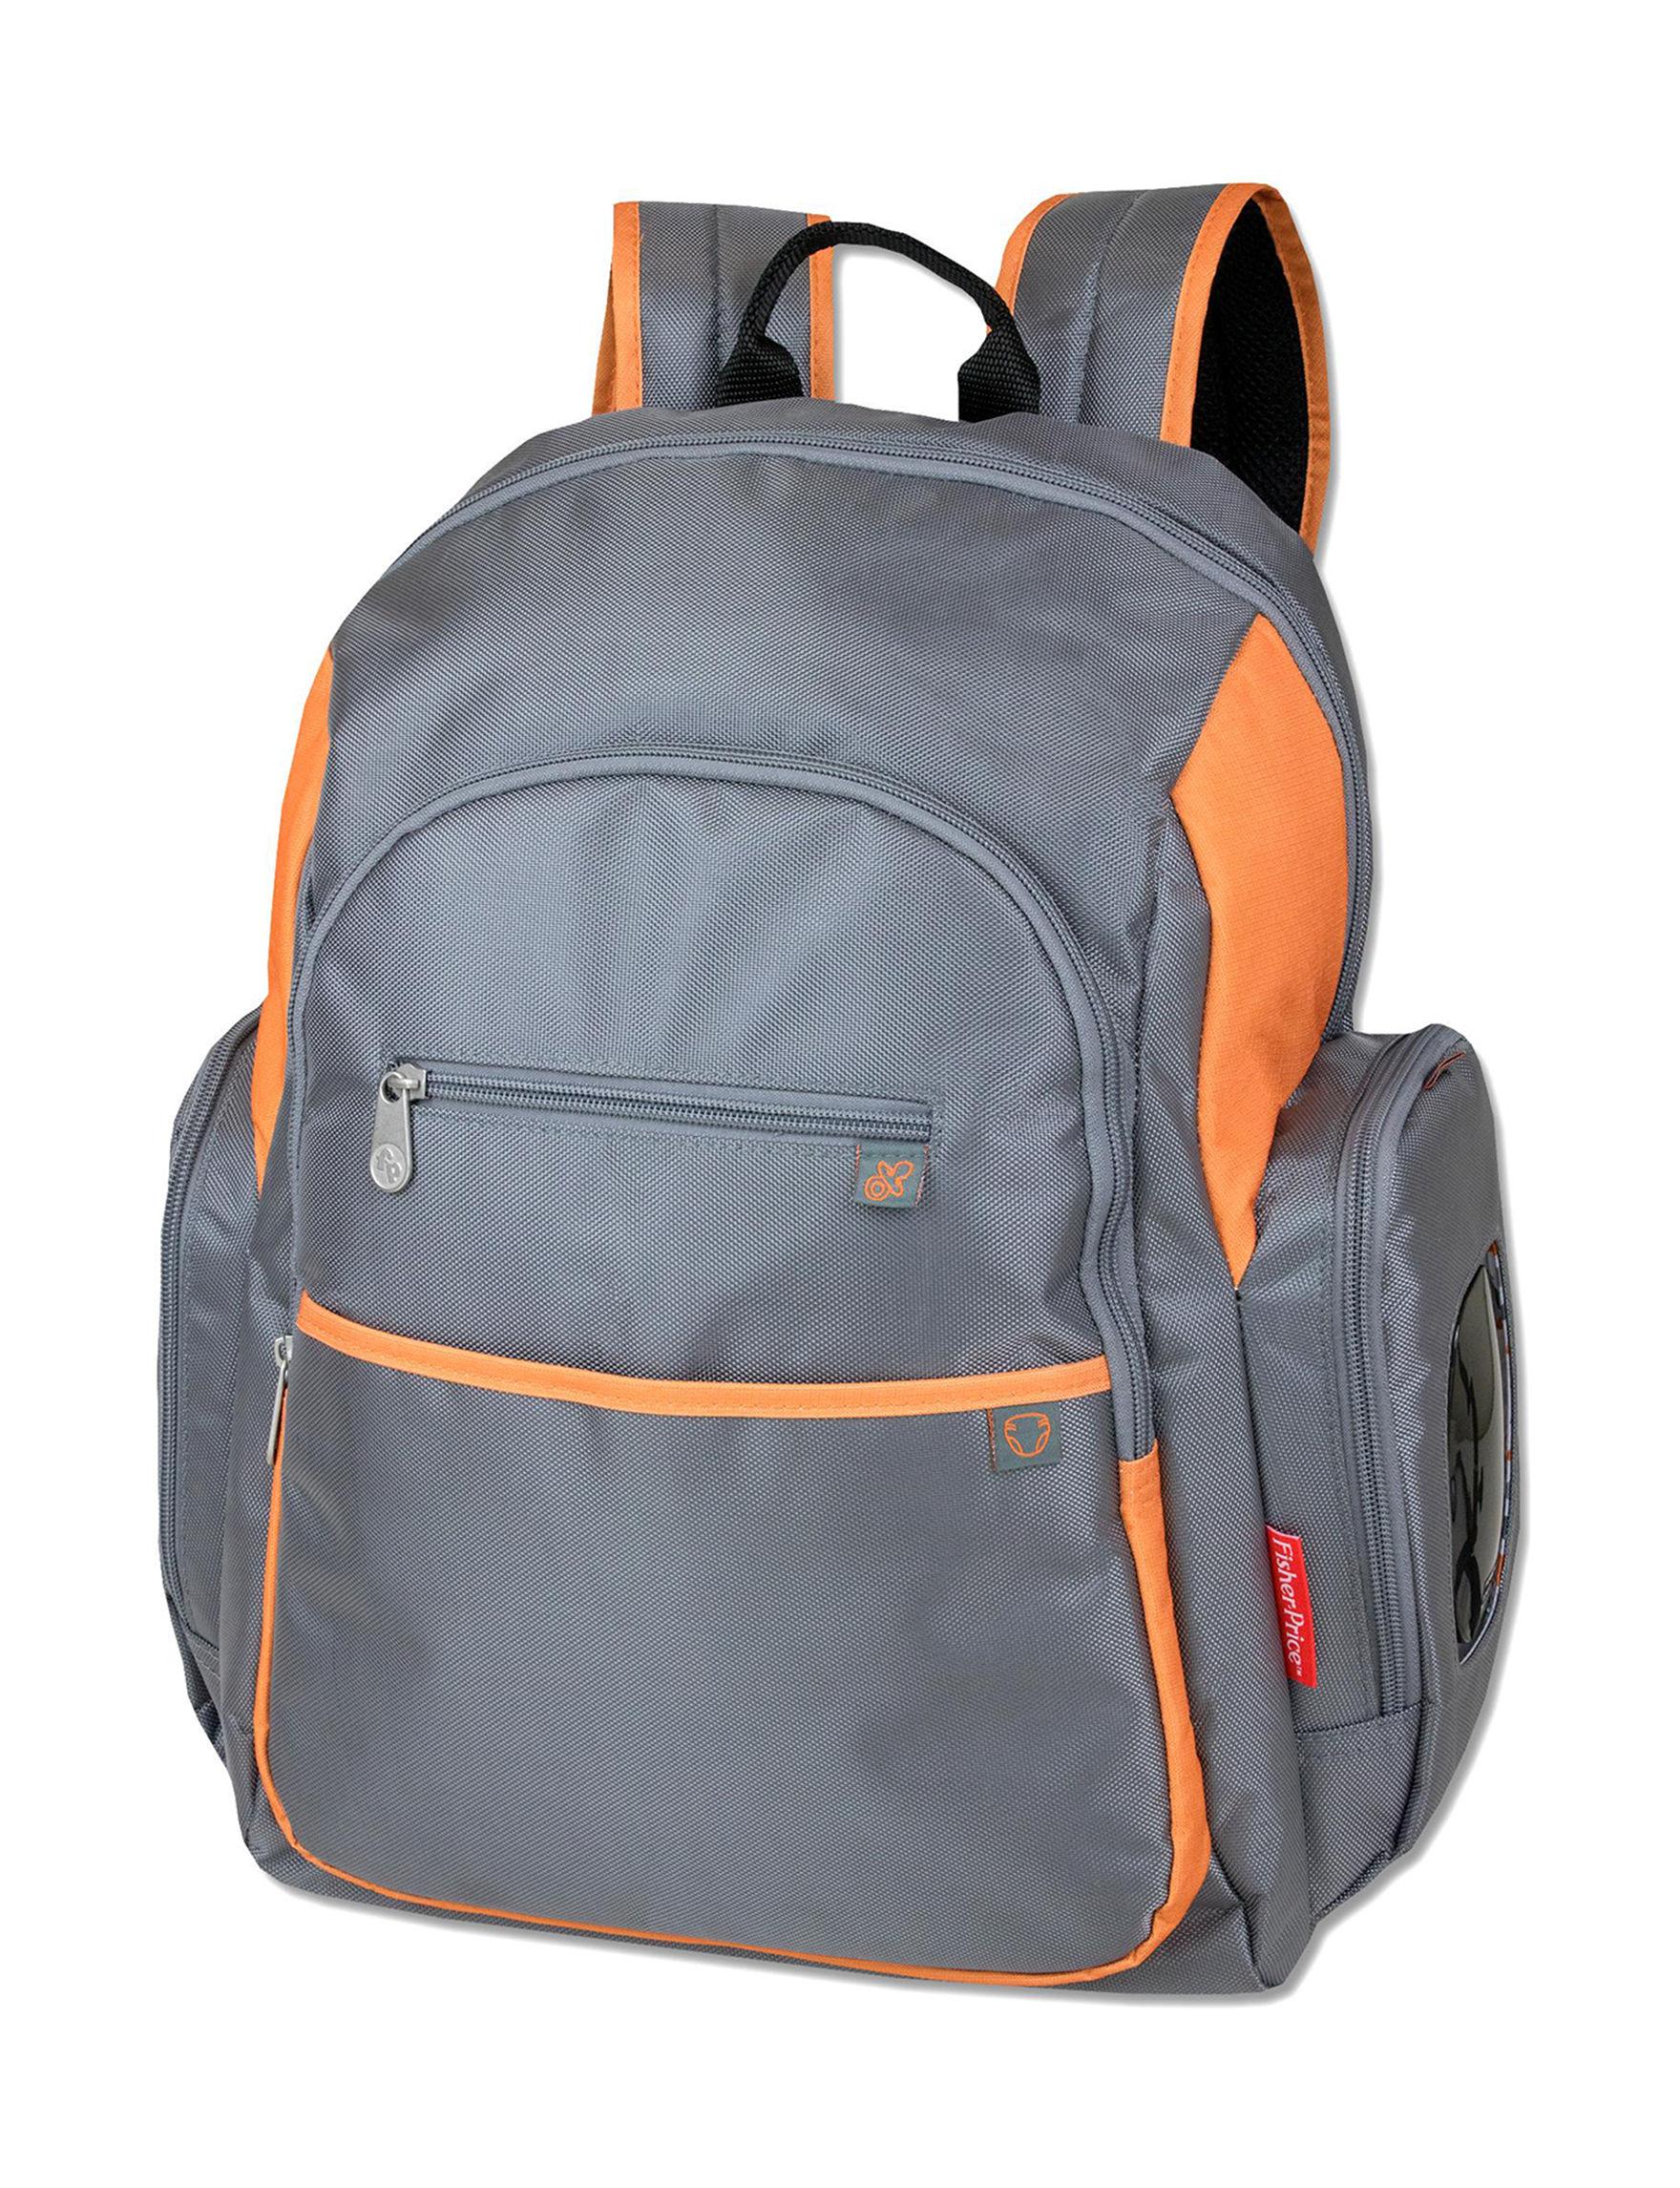 Baby Essentials Grey / Orange Diaper Bags